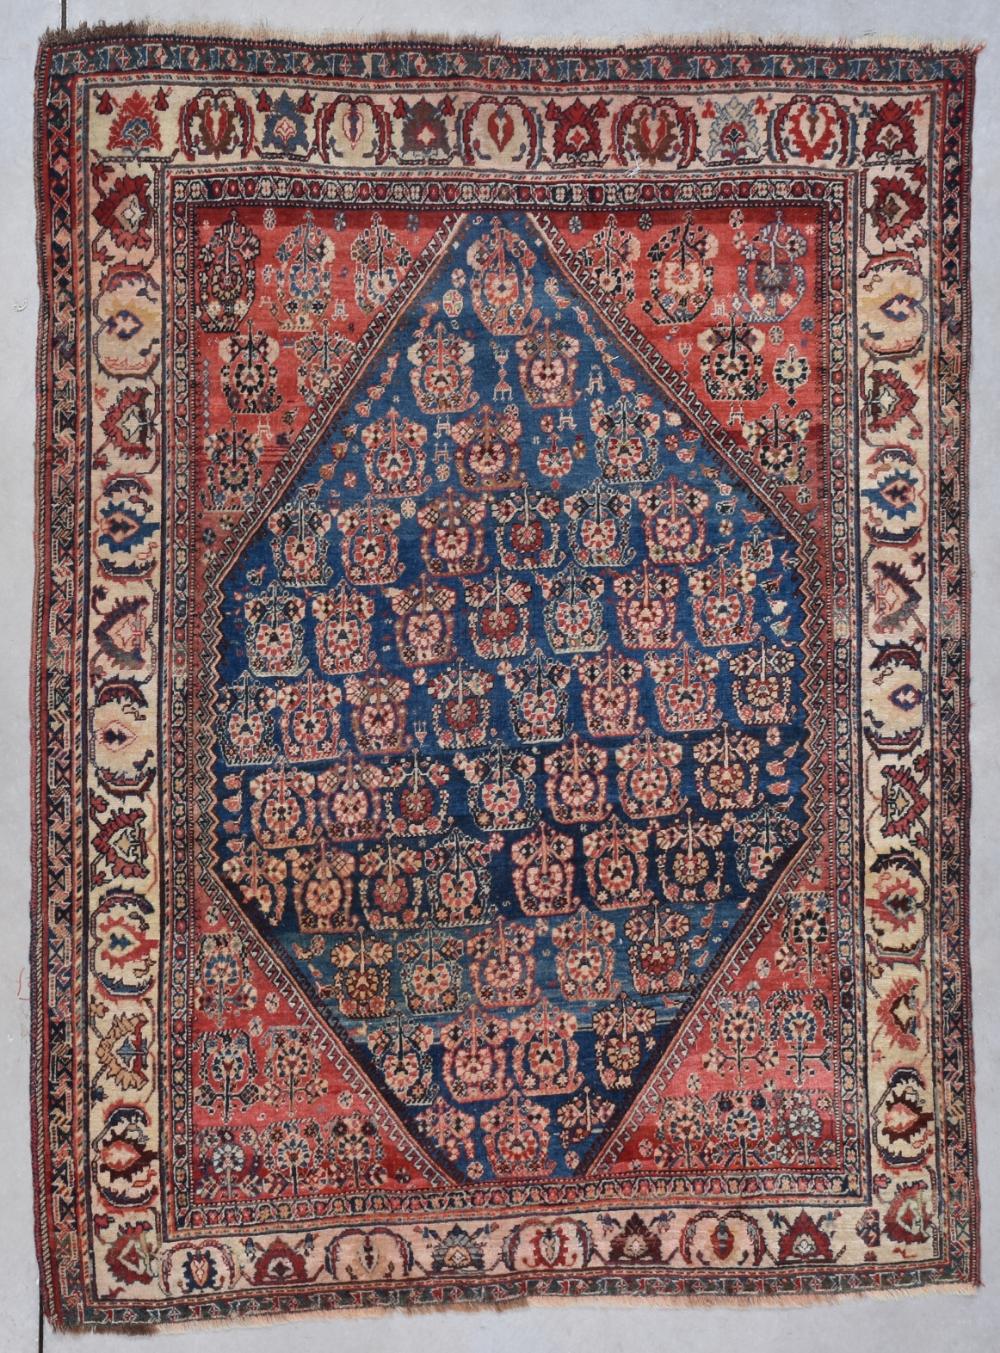 Antique Kula Oriental Rug 3 11 X 6 1 7944 Antique Oriental Rugs Antique Oriental Rugs Rugs Antiques